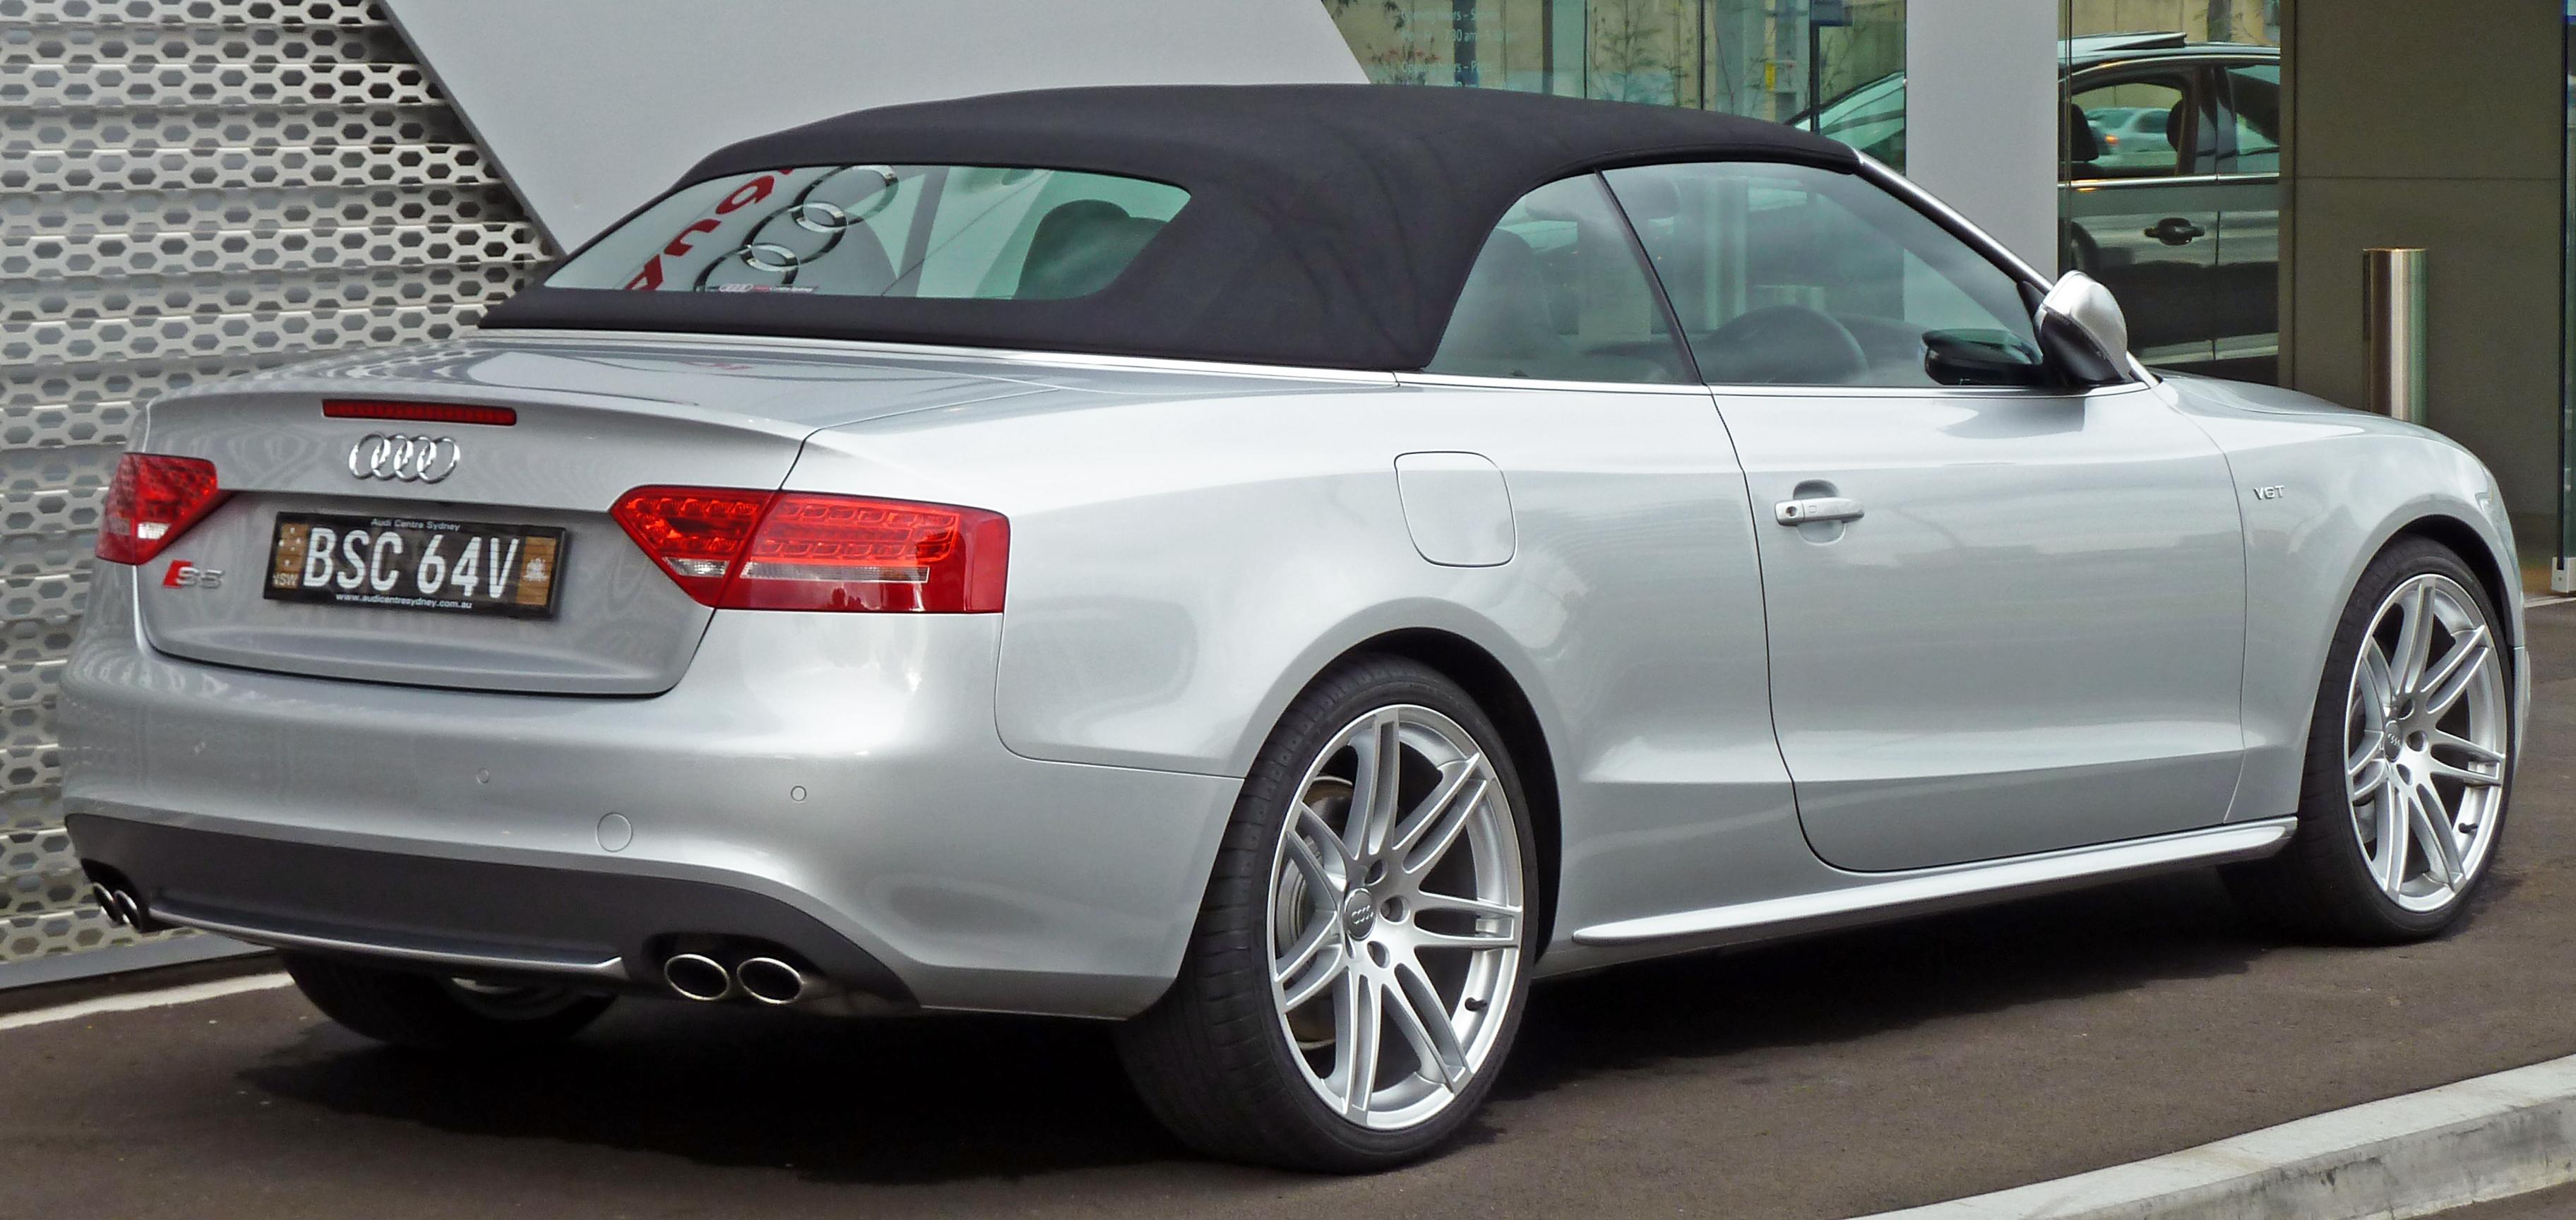 2009 Audi S5 Image 15